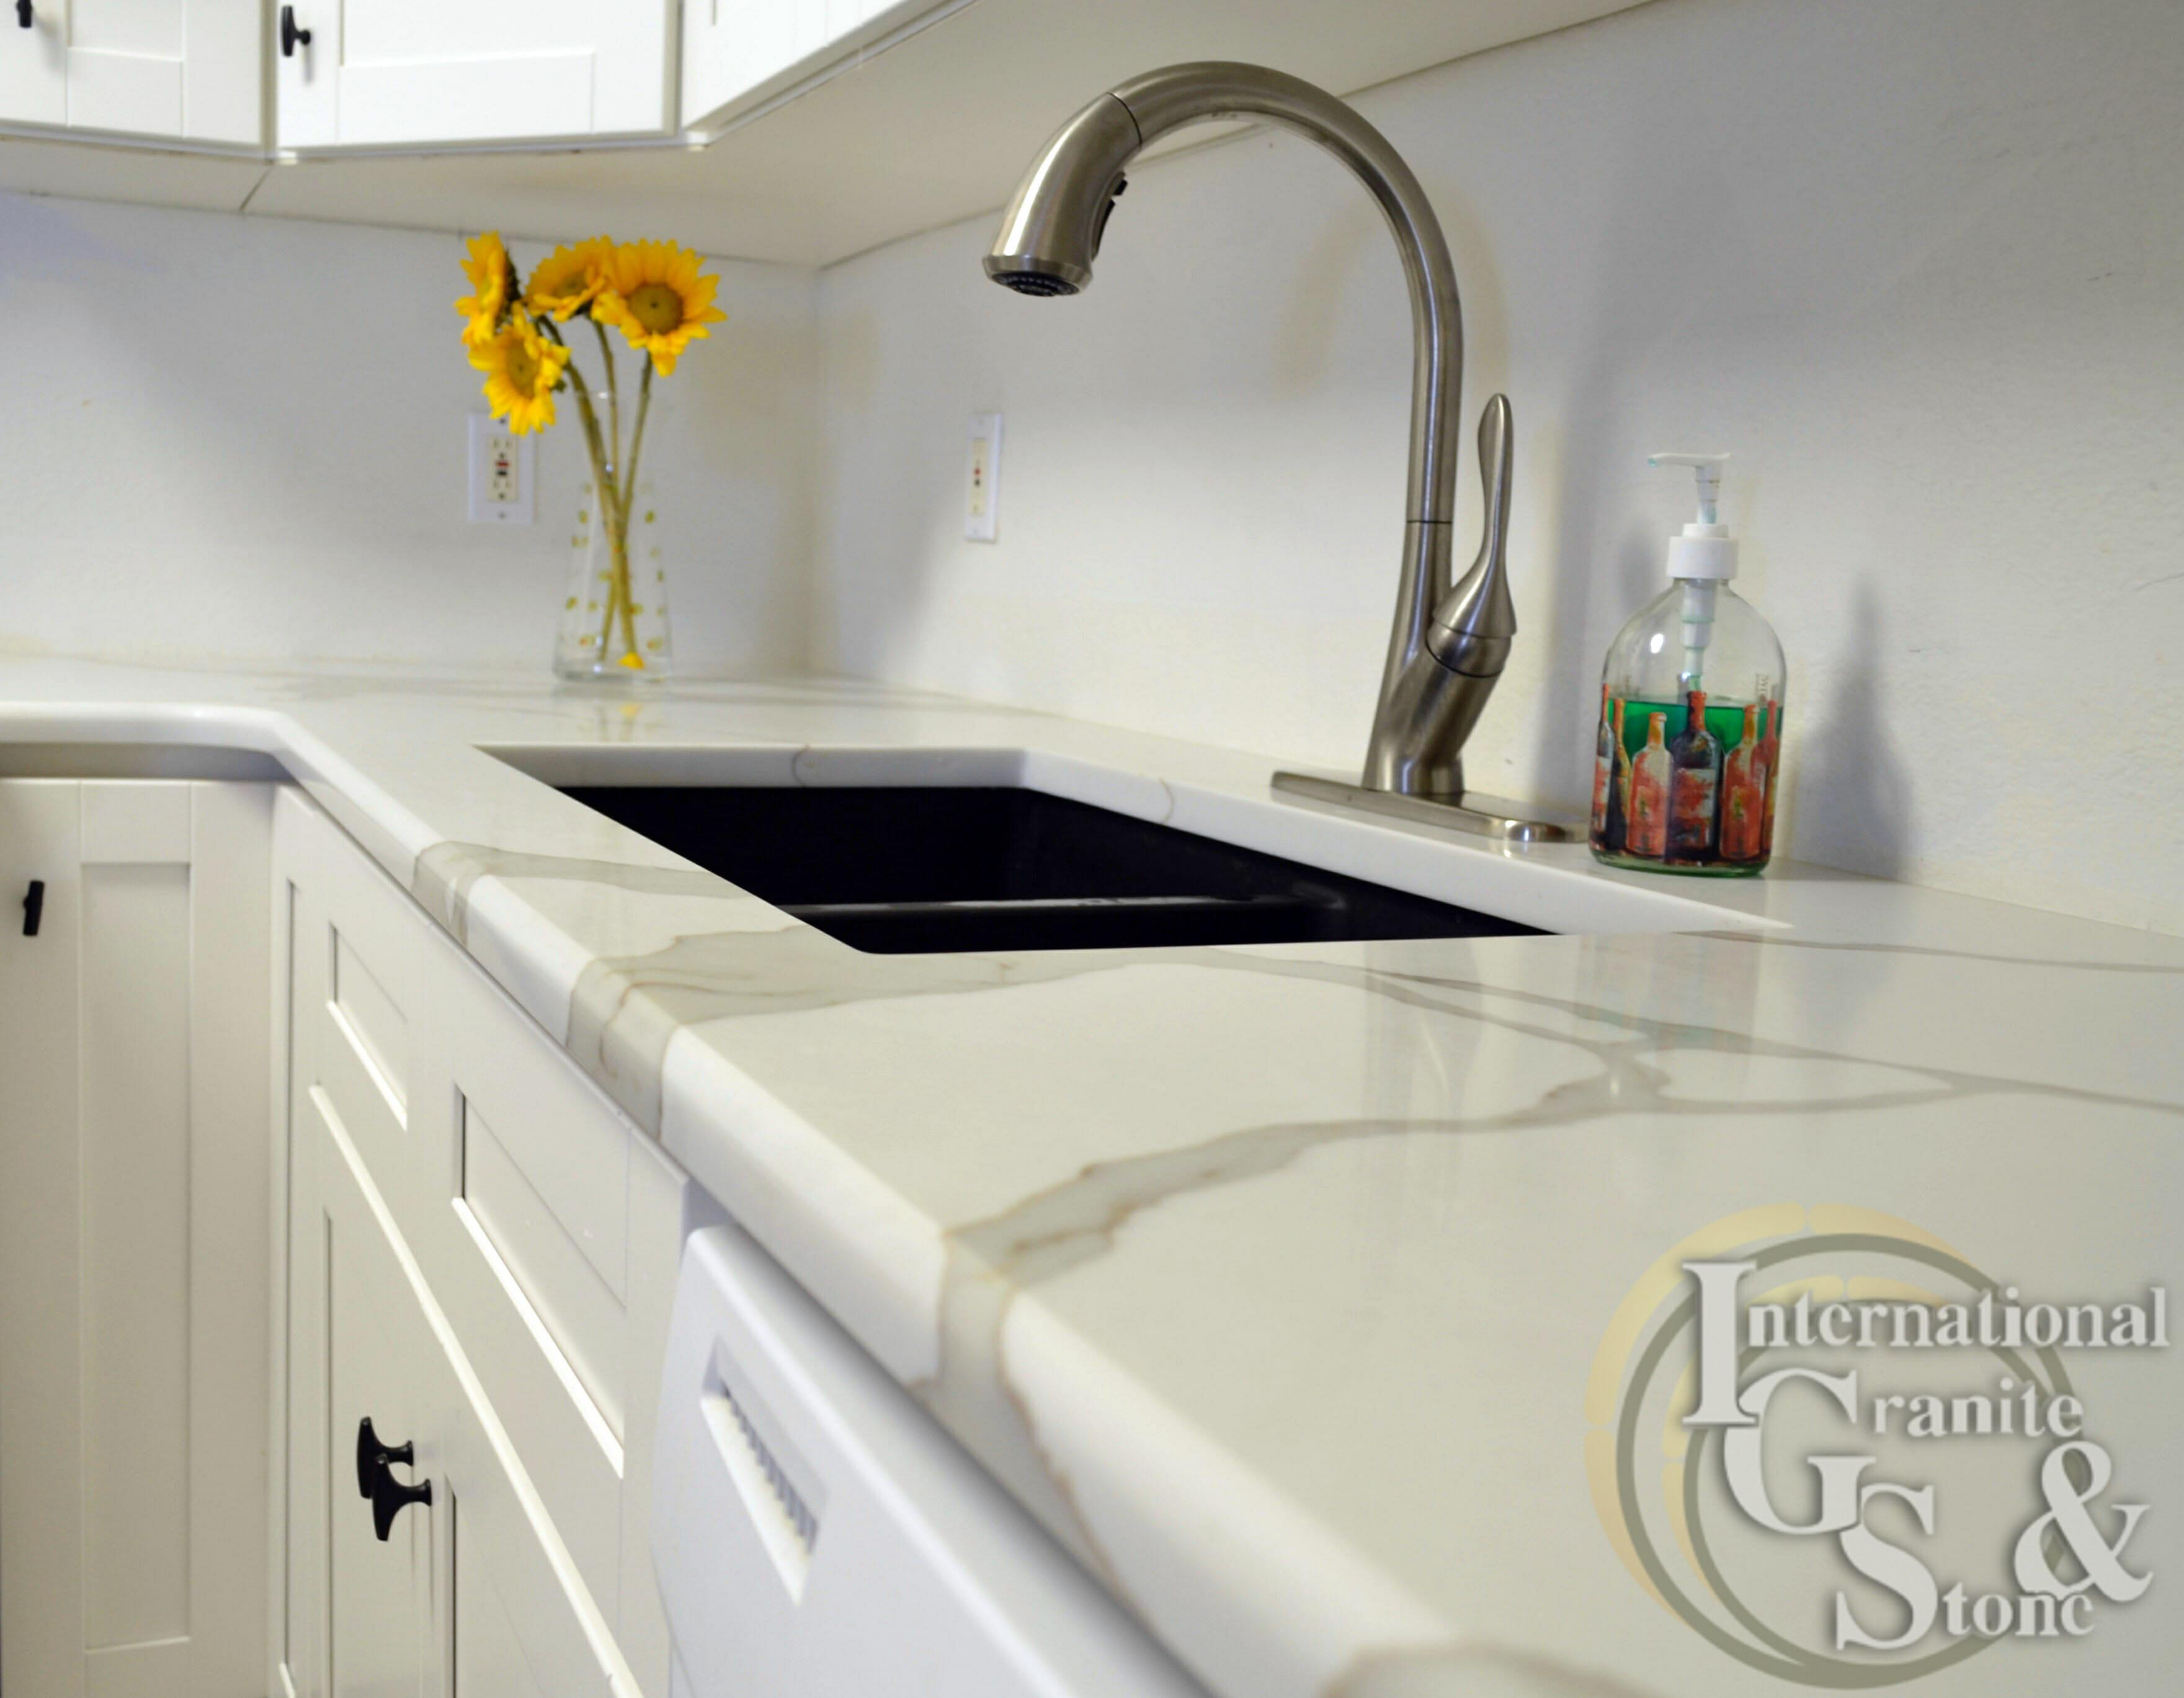 Pictures of Granite Countertops Quartz Countertops in Tampa Florida